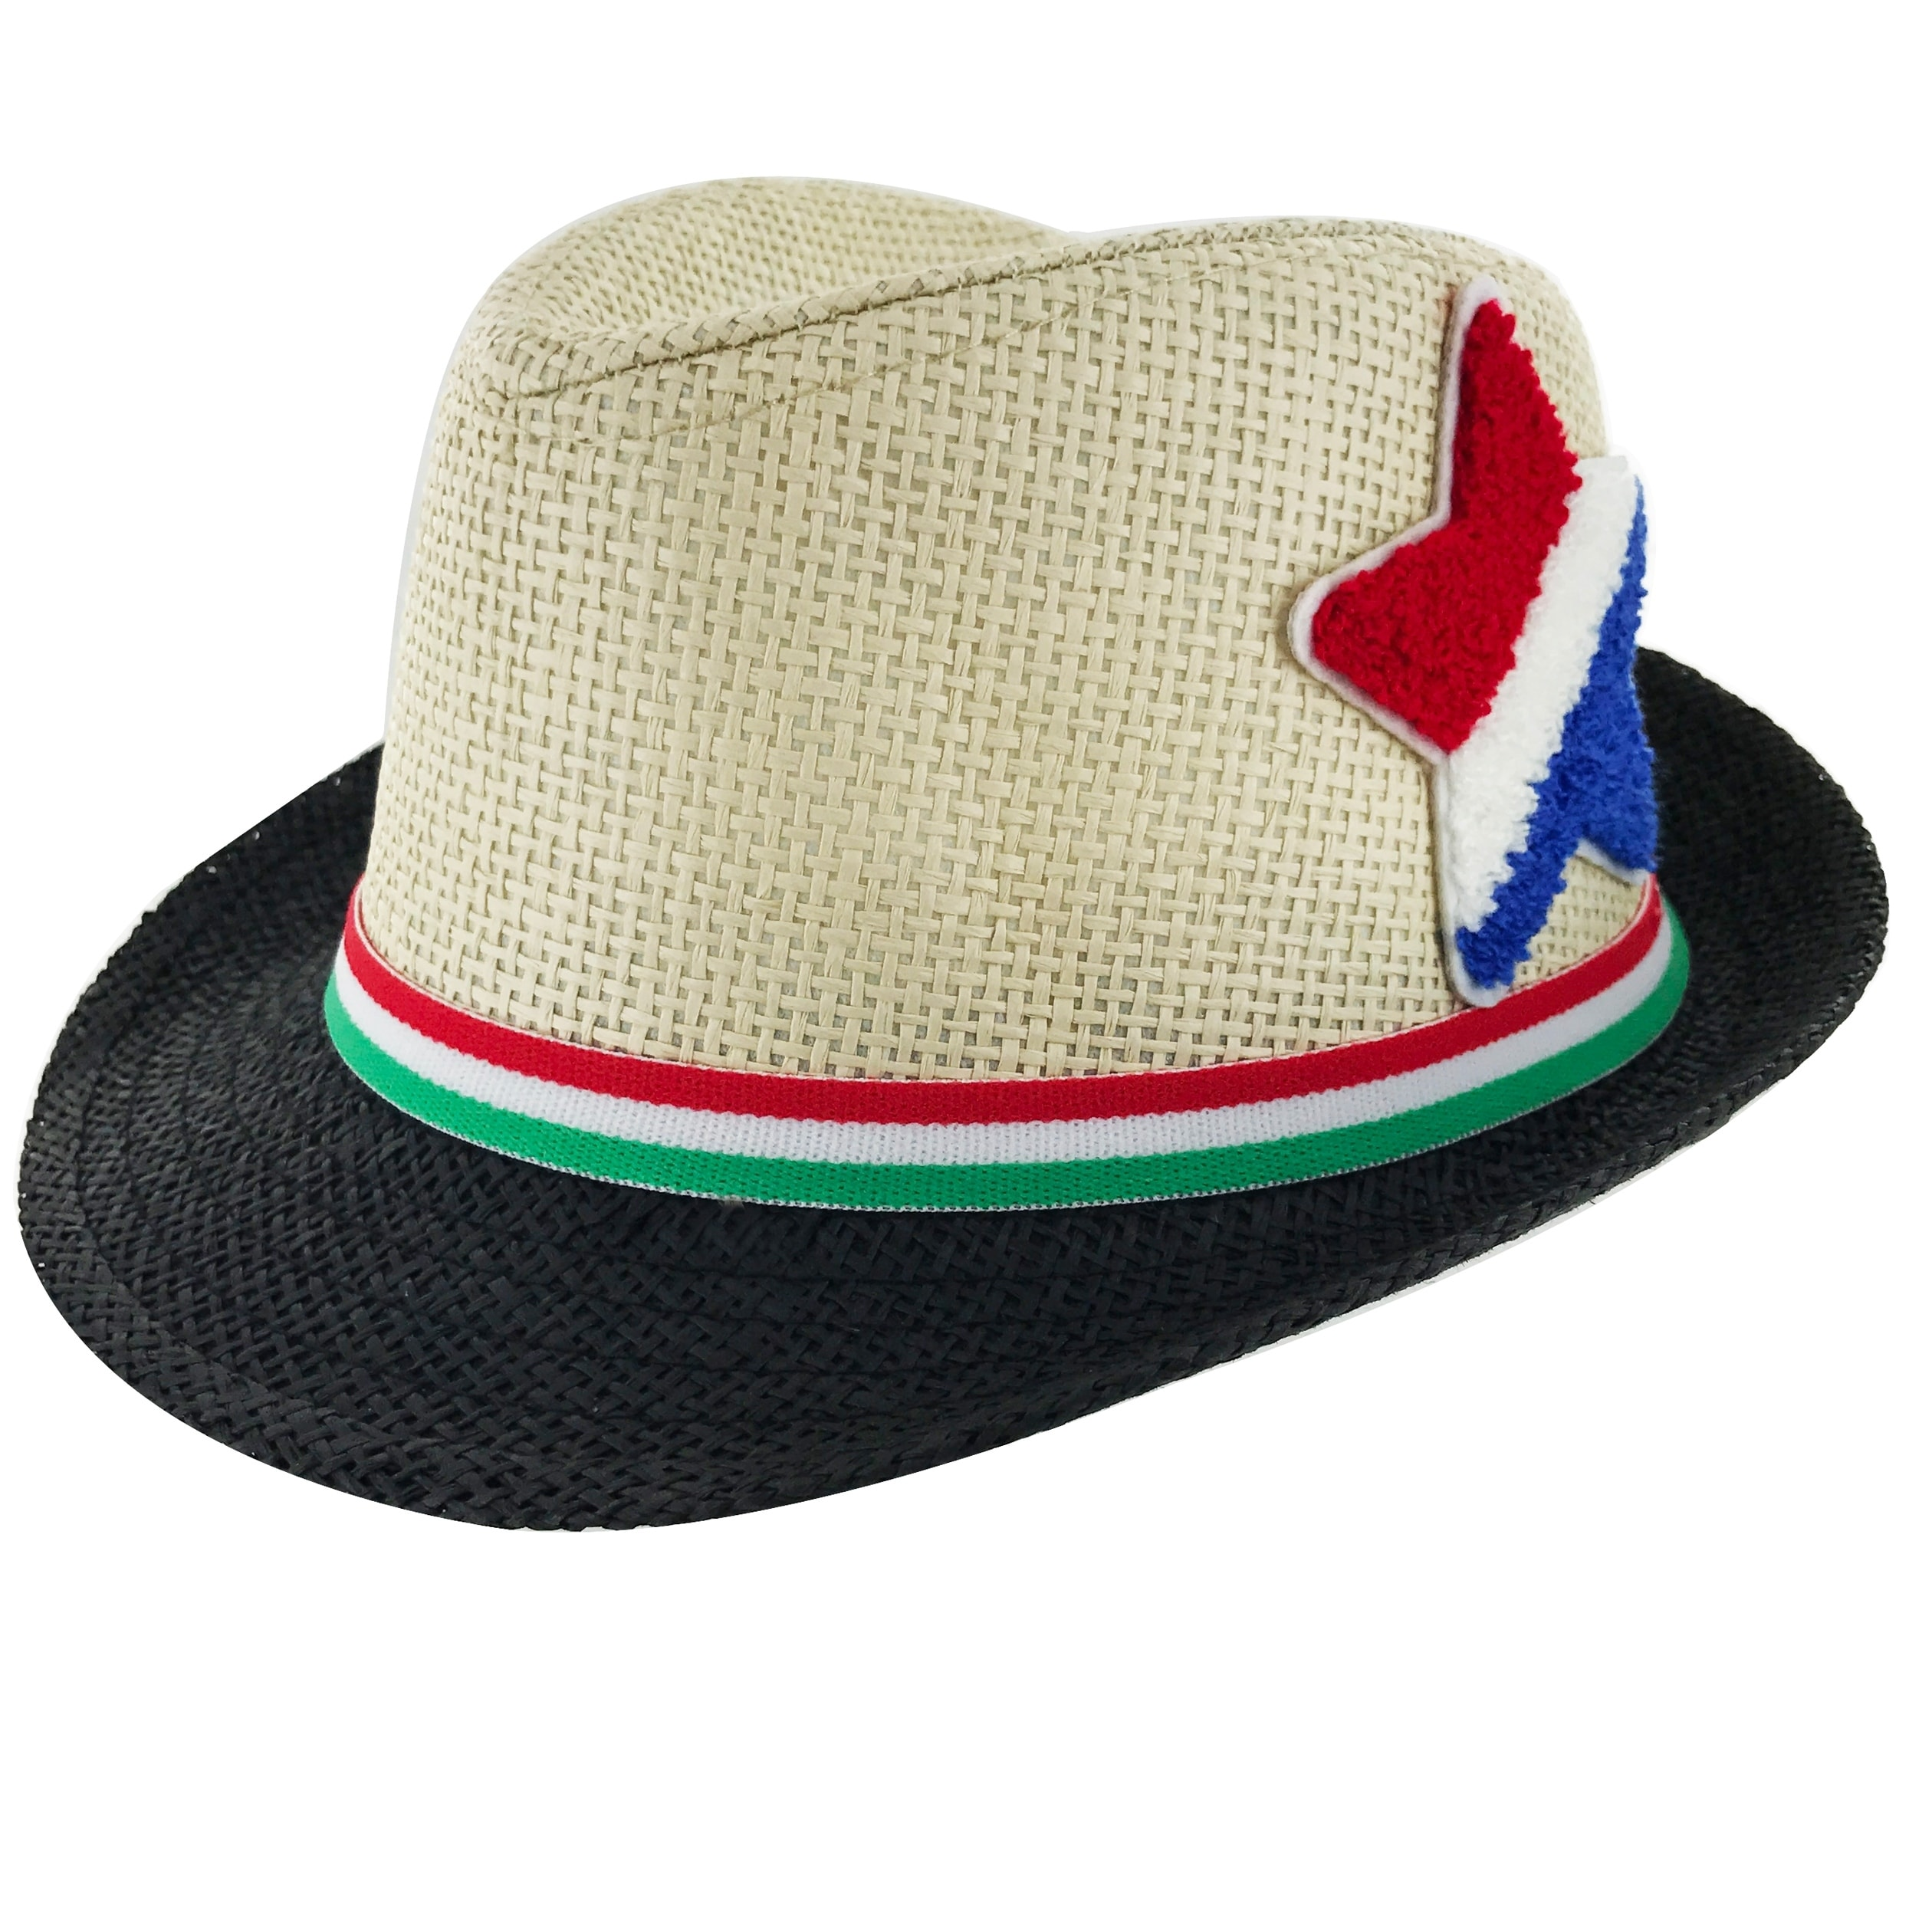 dbf882e2208 Faddism Kids Unisex Slim Belt Cuban Brim Fedora Hat Model 02